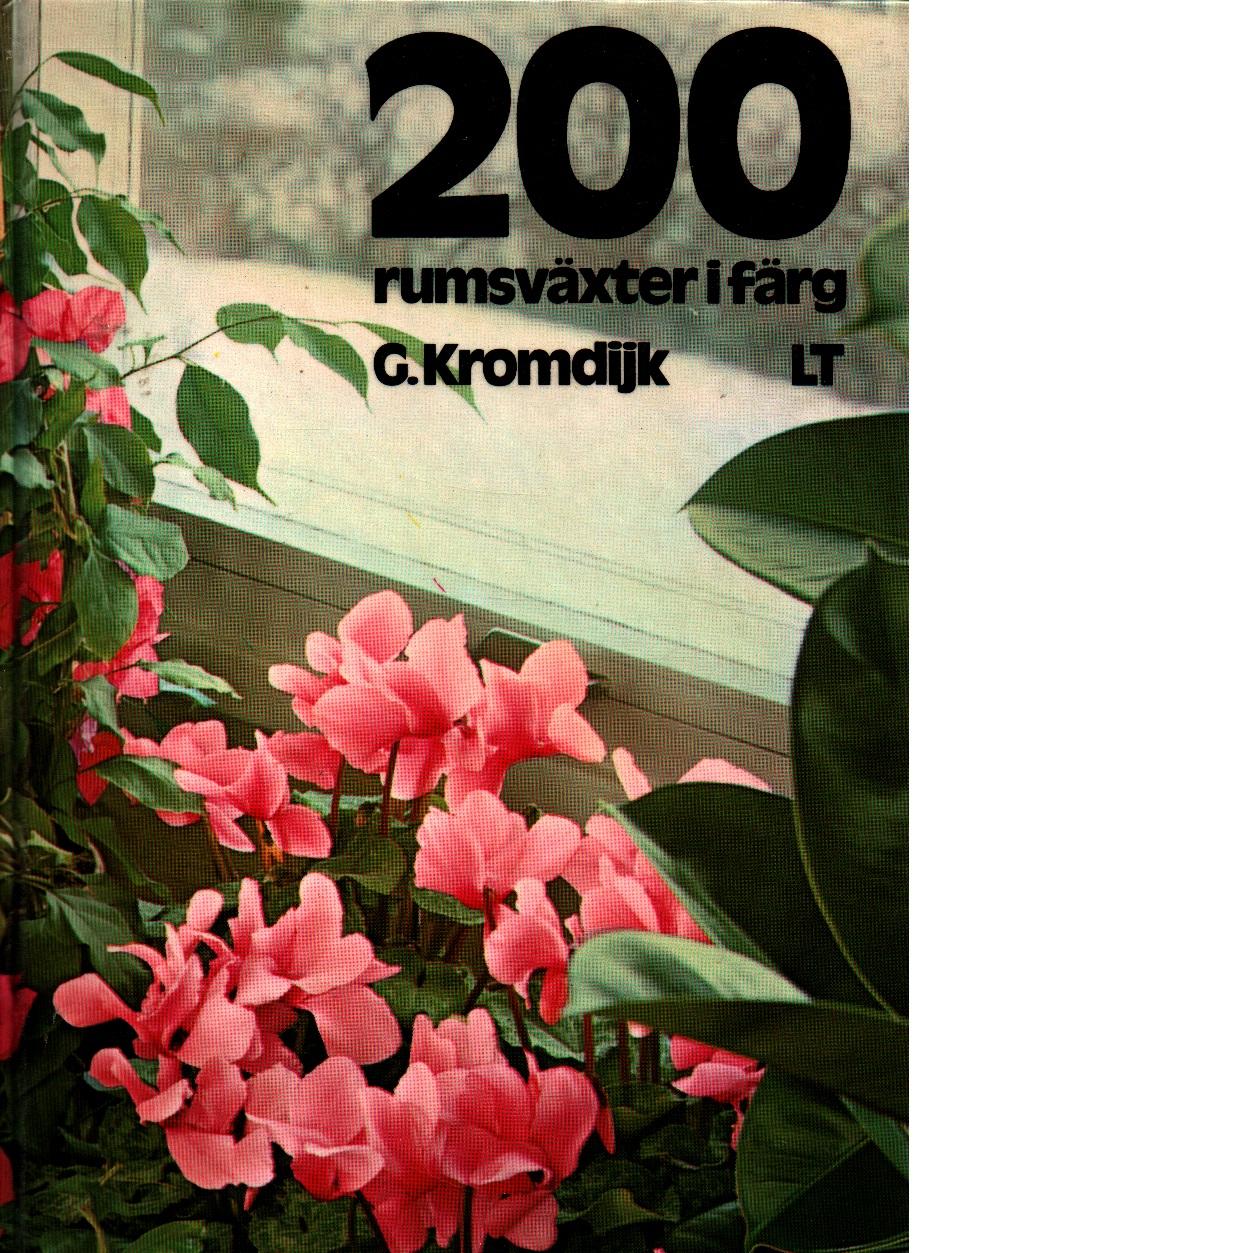 200 rumsväxter i färg - Kromdijk, Gerard